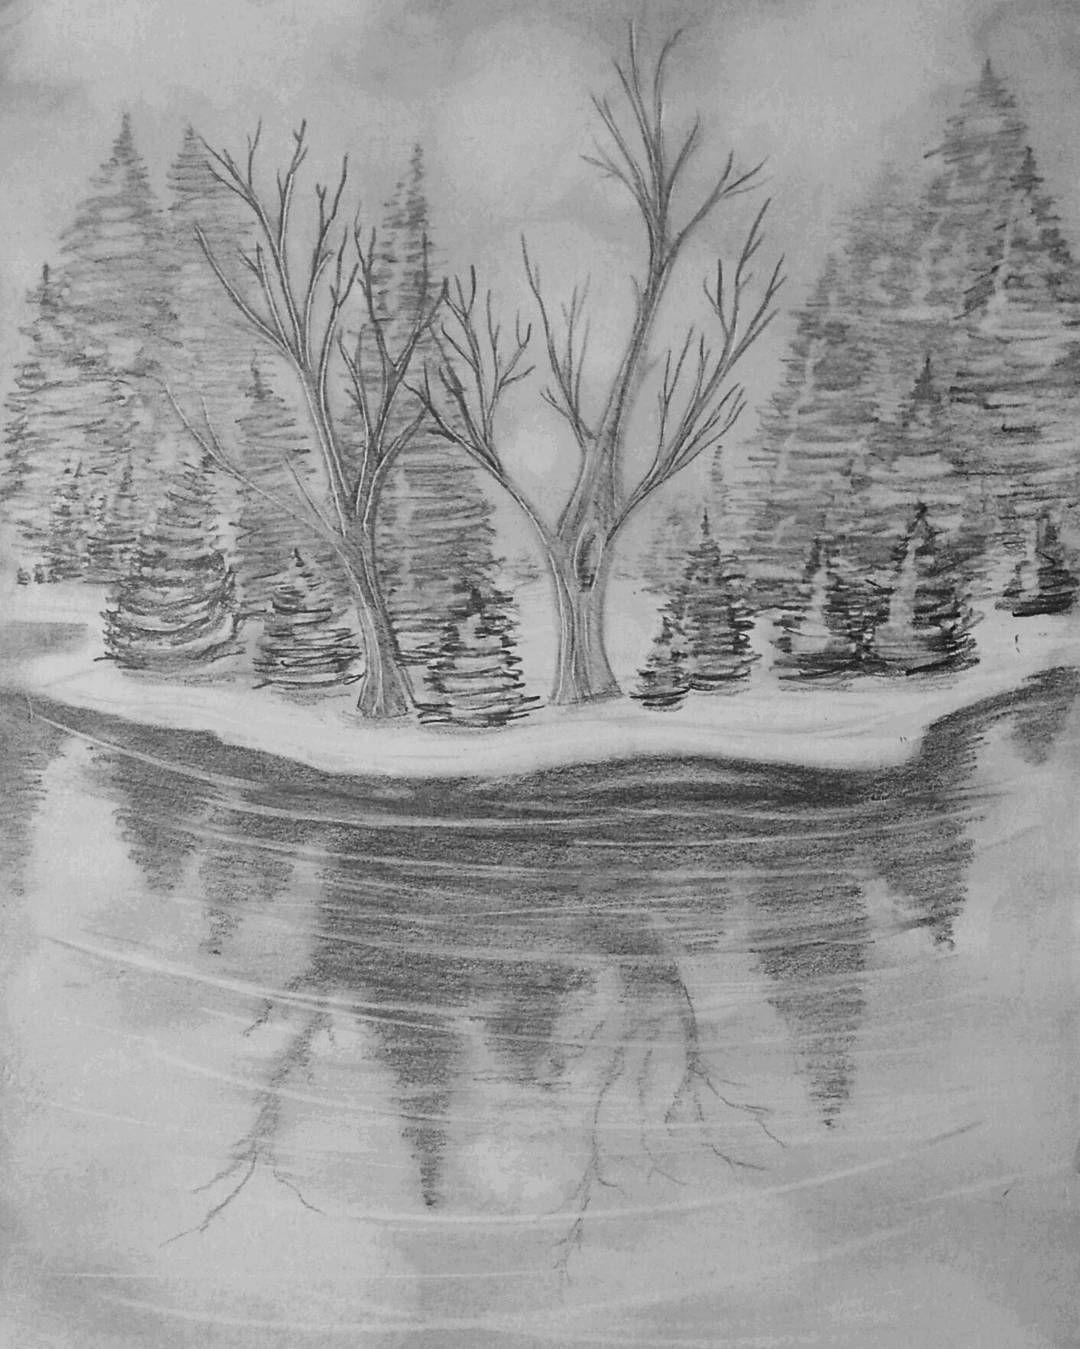 Pencil Drawing Original Handmade Item Tree Art Acid Free Paper Nature Illustration Wall Art Pencil Sketch Matte Board